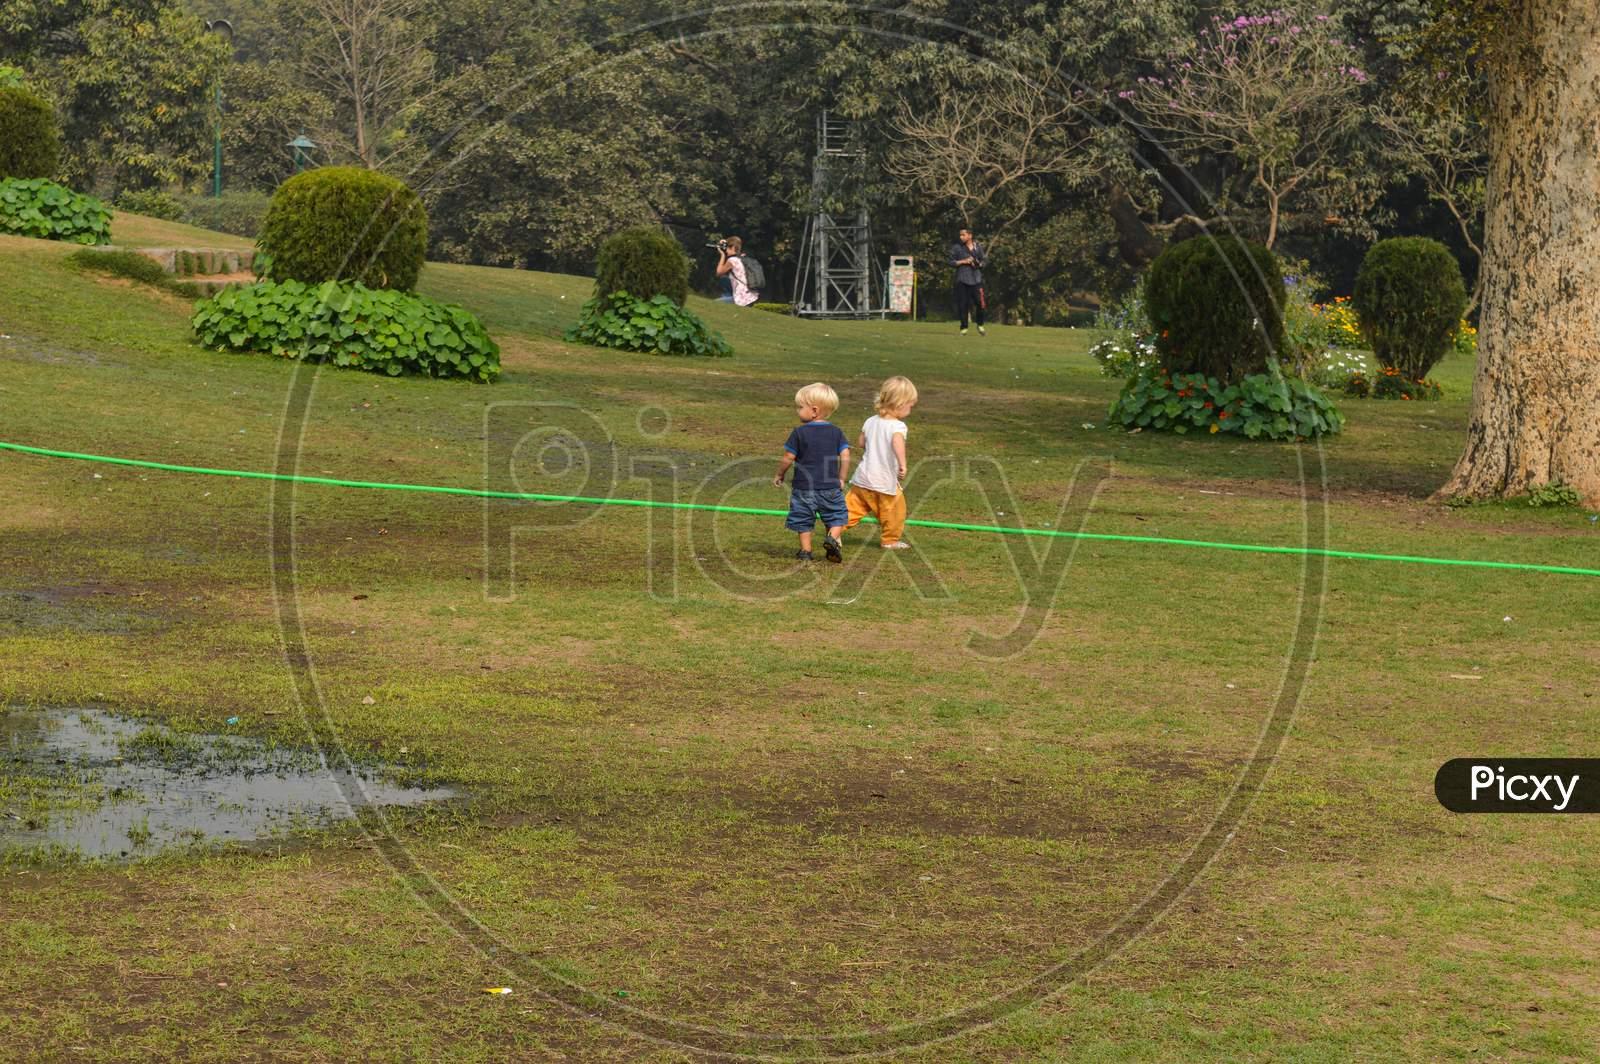 A Siblings Playing And Running At Park, Lawn At Winter Foggy Morning.